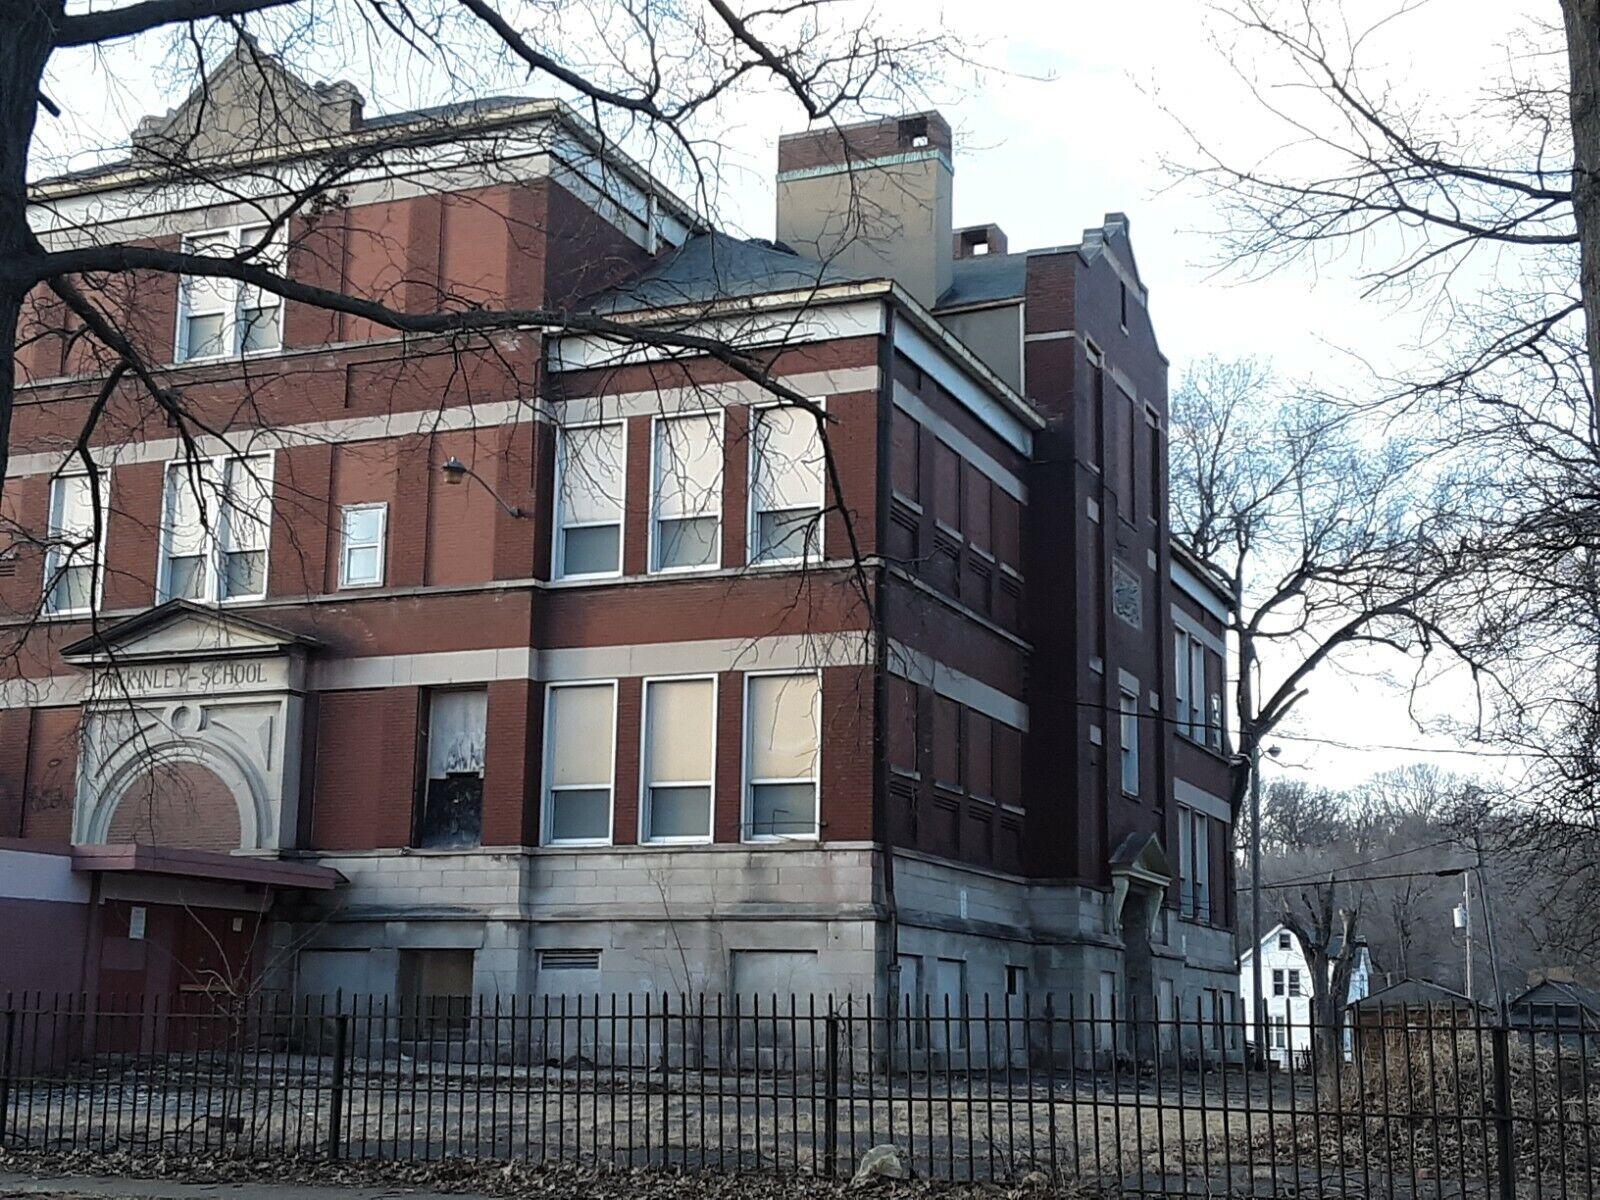 Commercial School Building For Sale  - $59,000.00